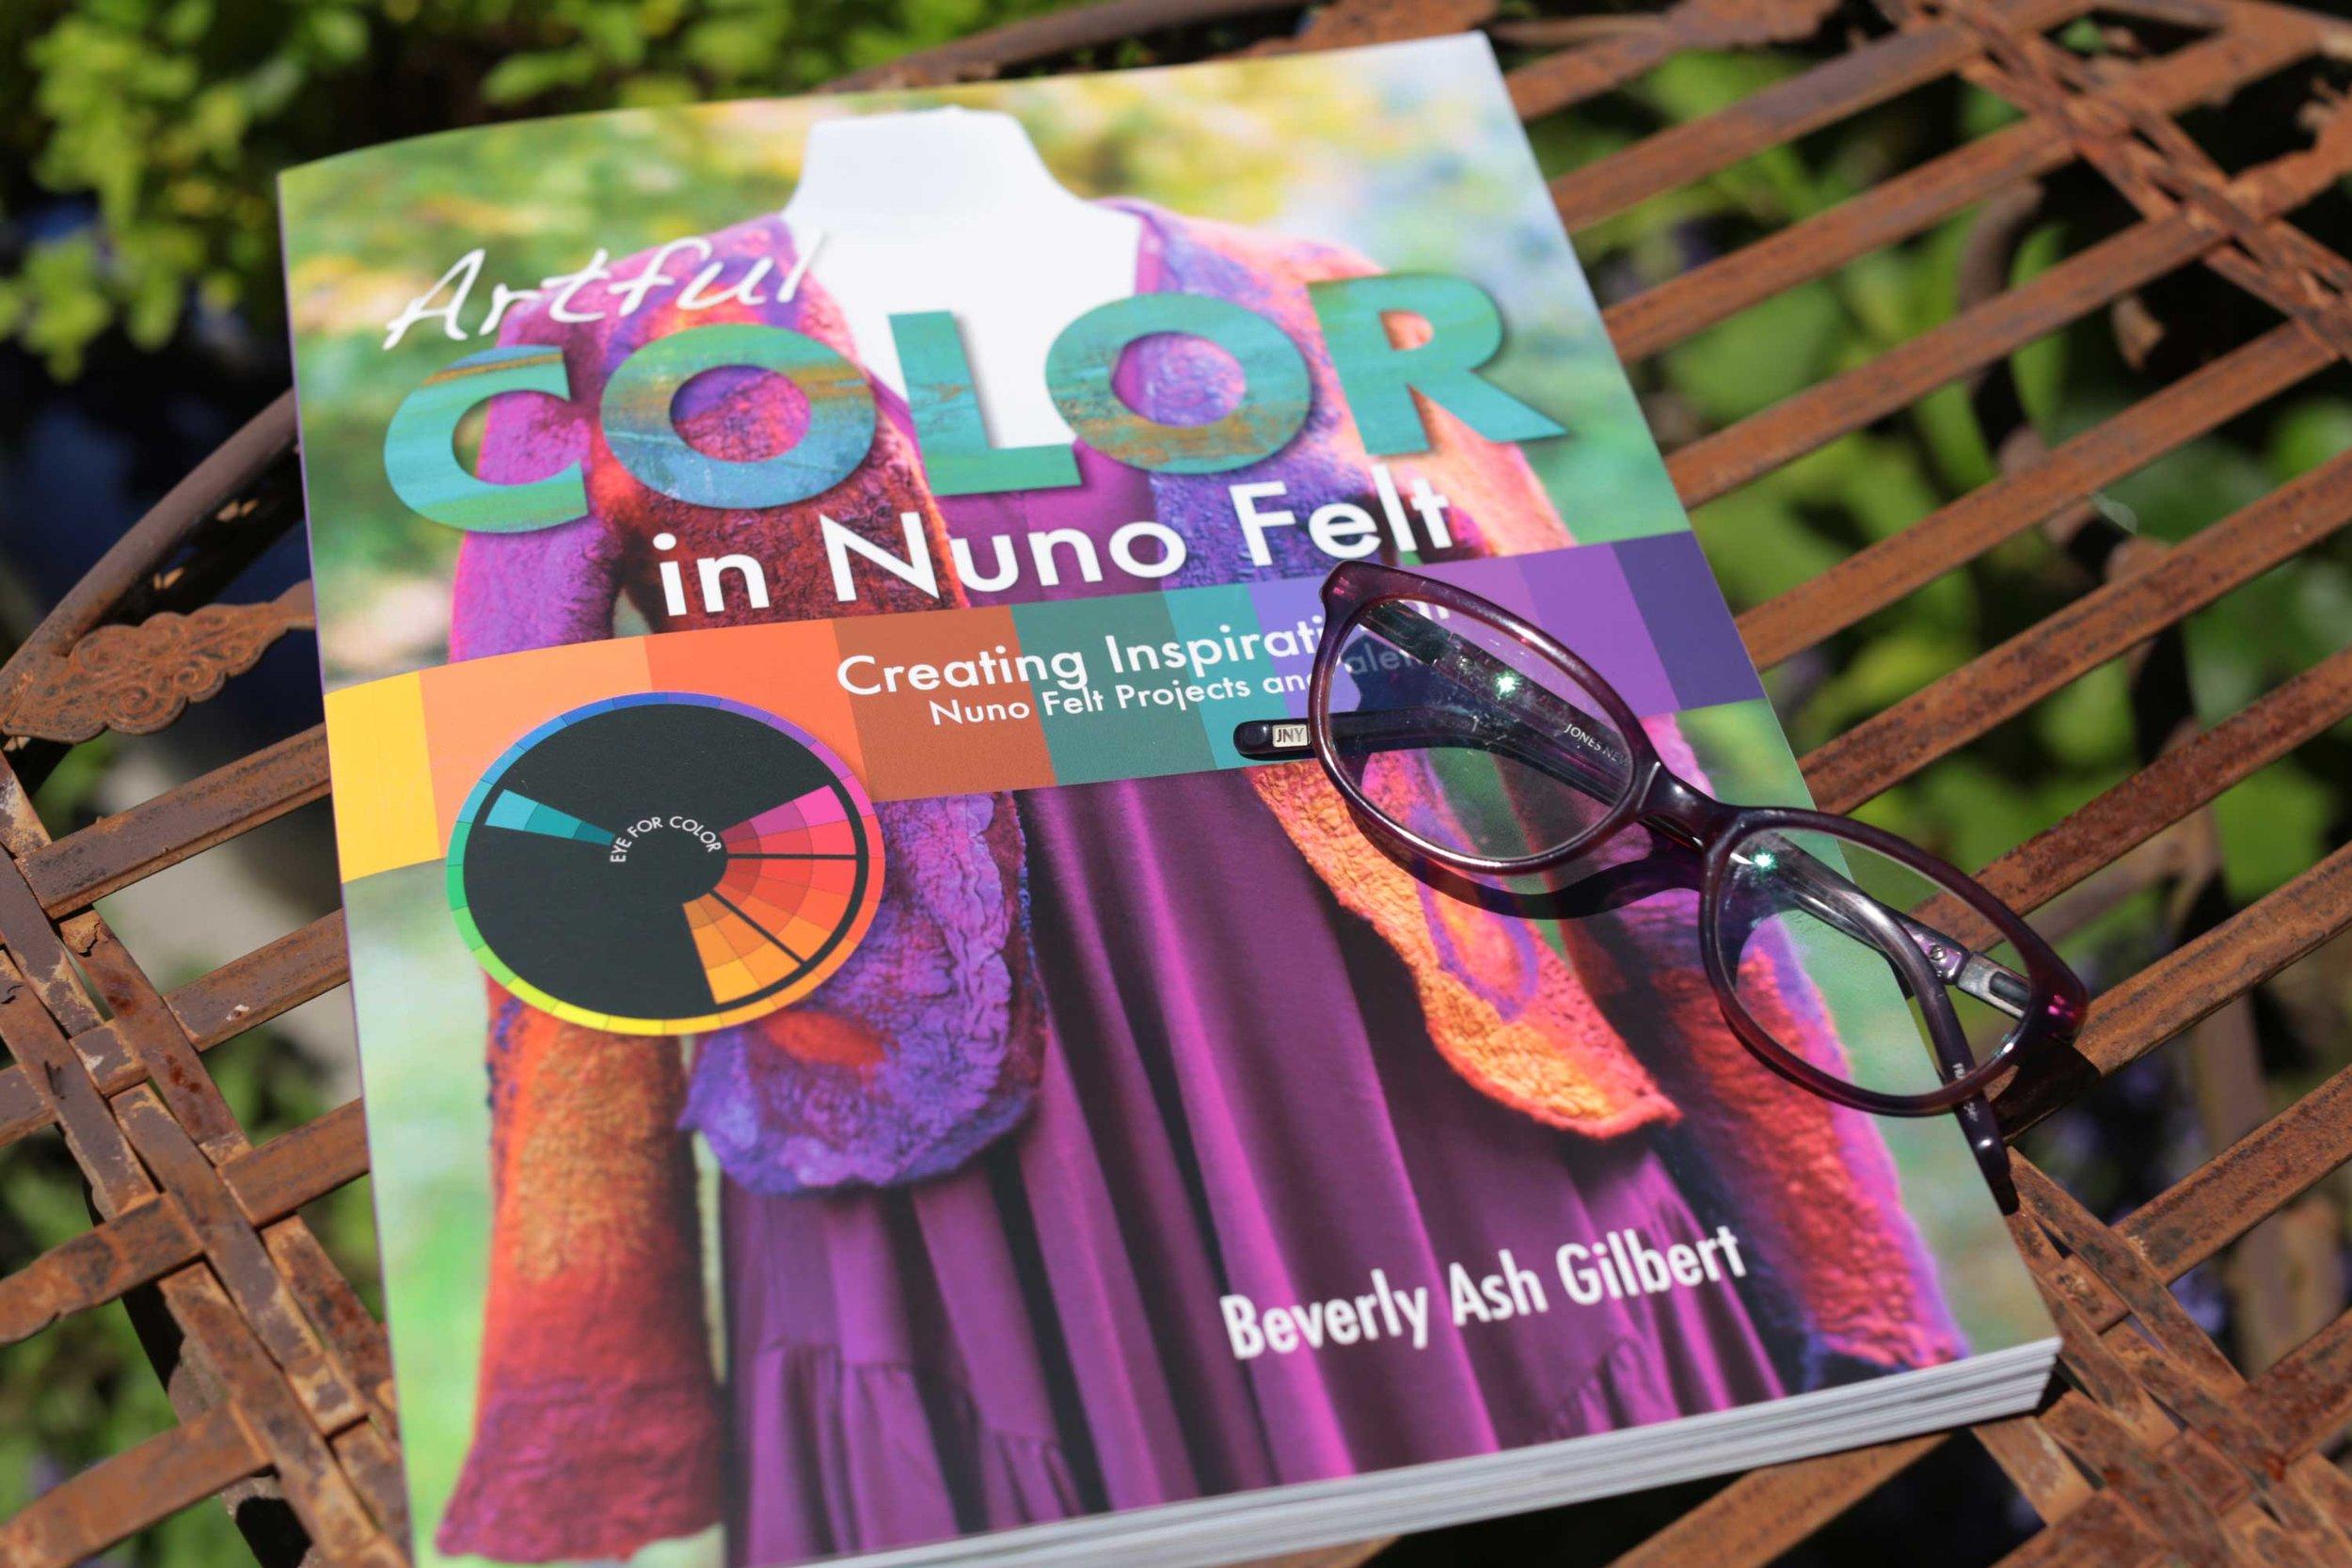 Artful Color in Nuno Felt _Cover